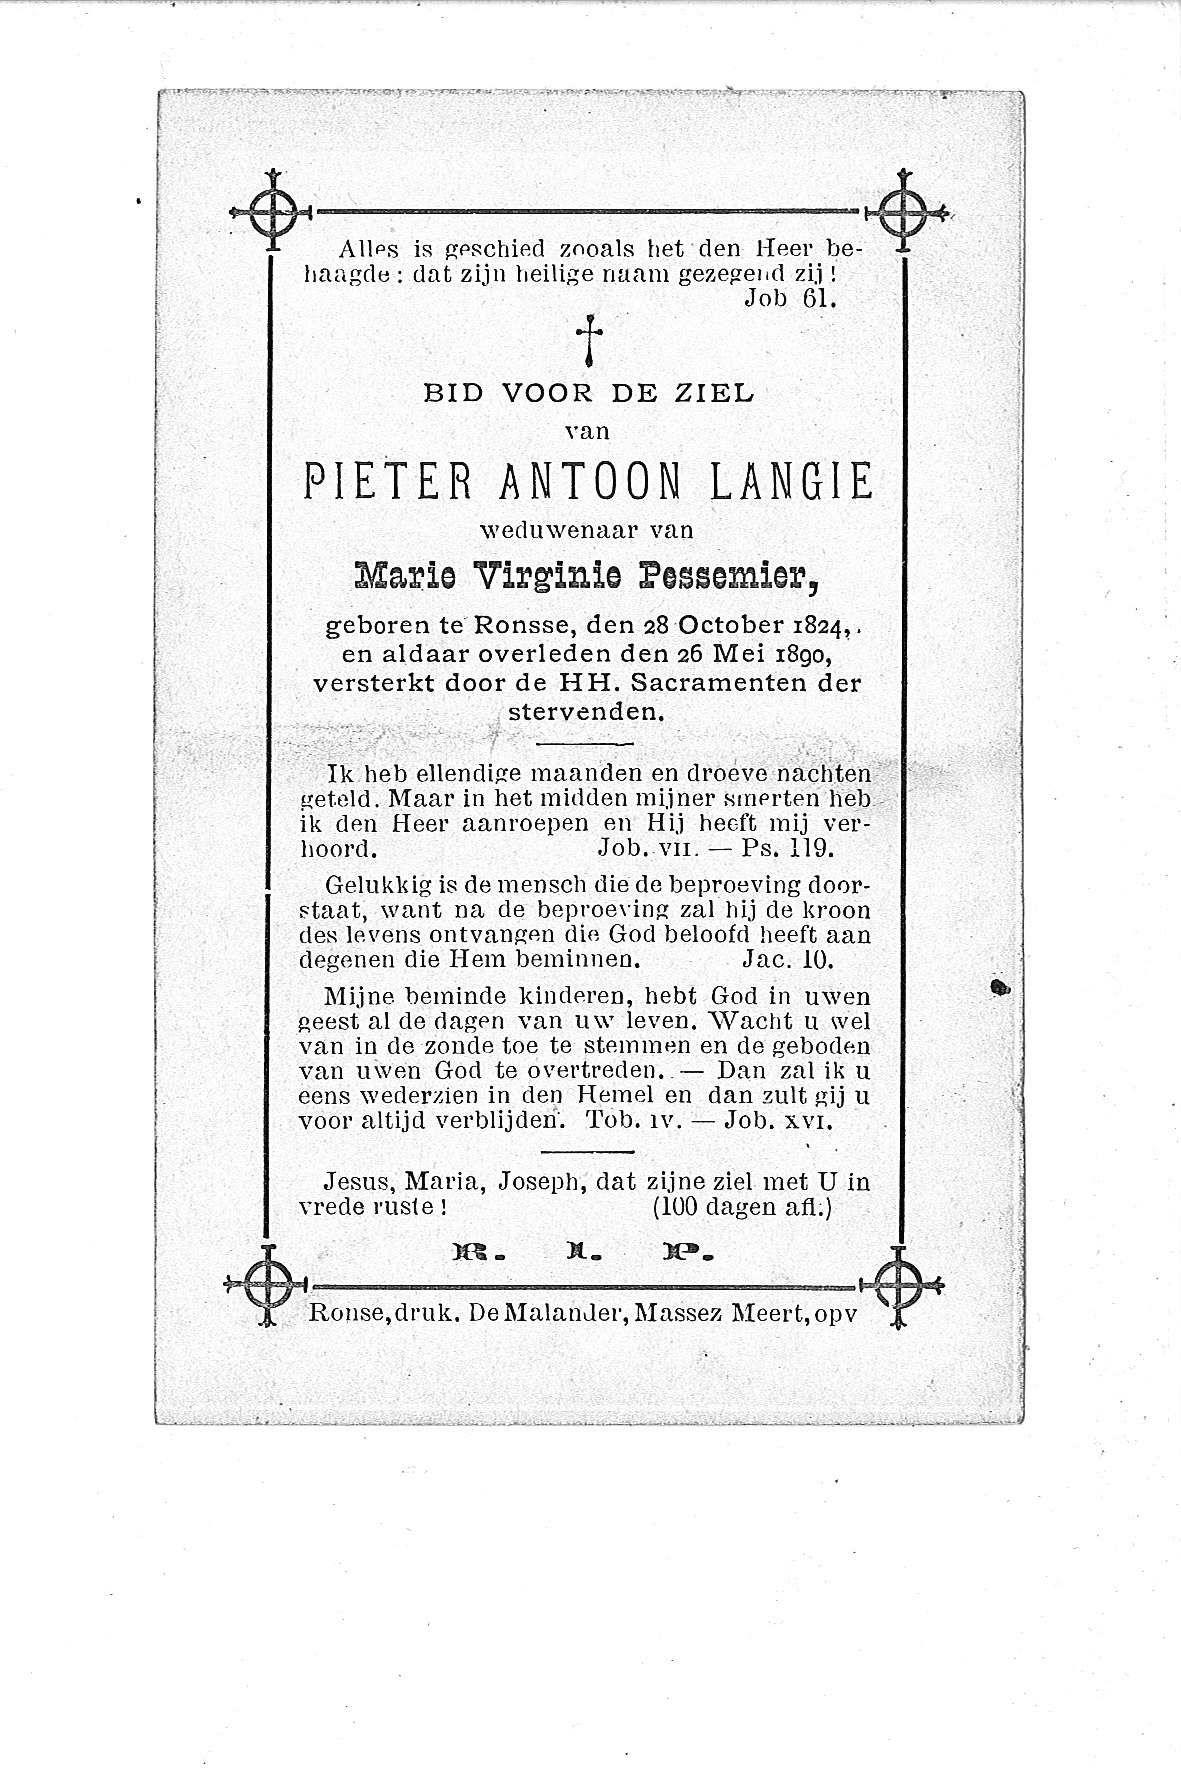 Pieter-Antoon(1890)20091215100406_00001.jpg